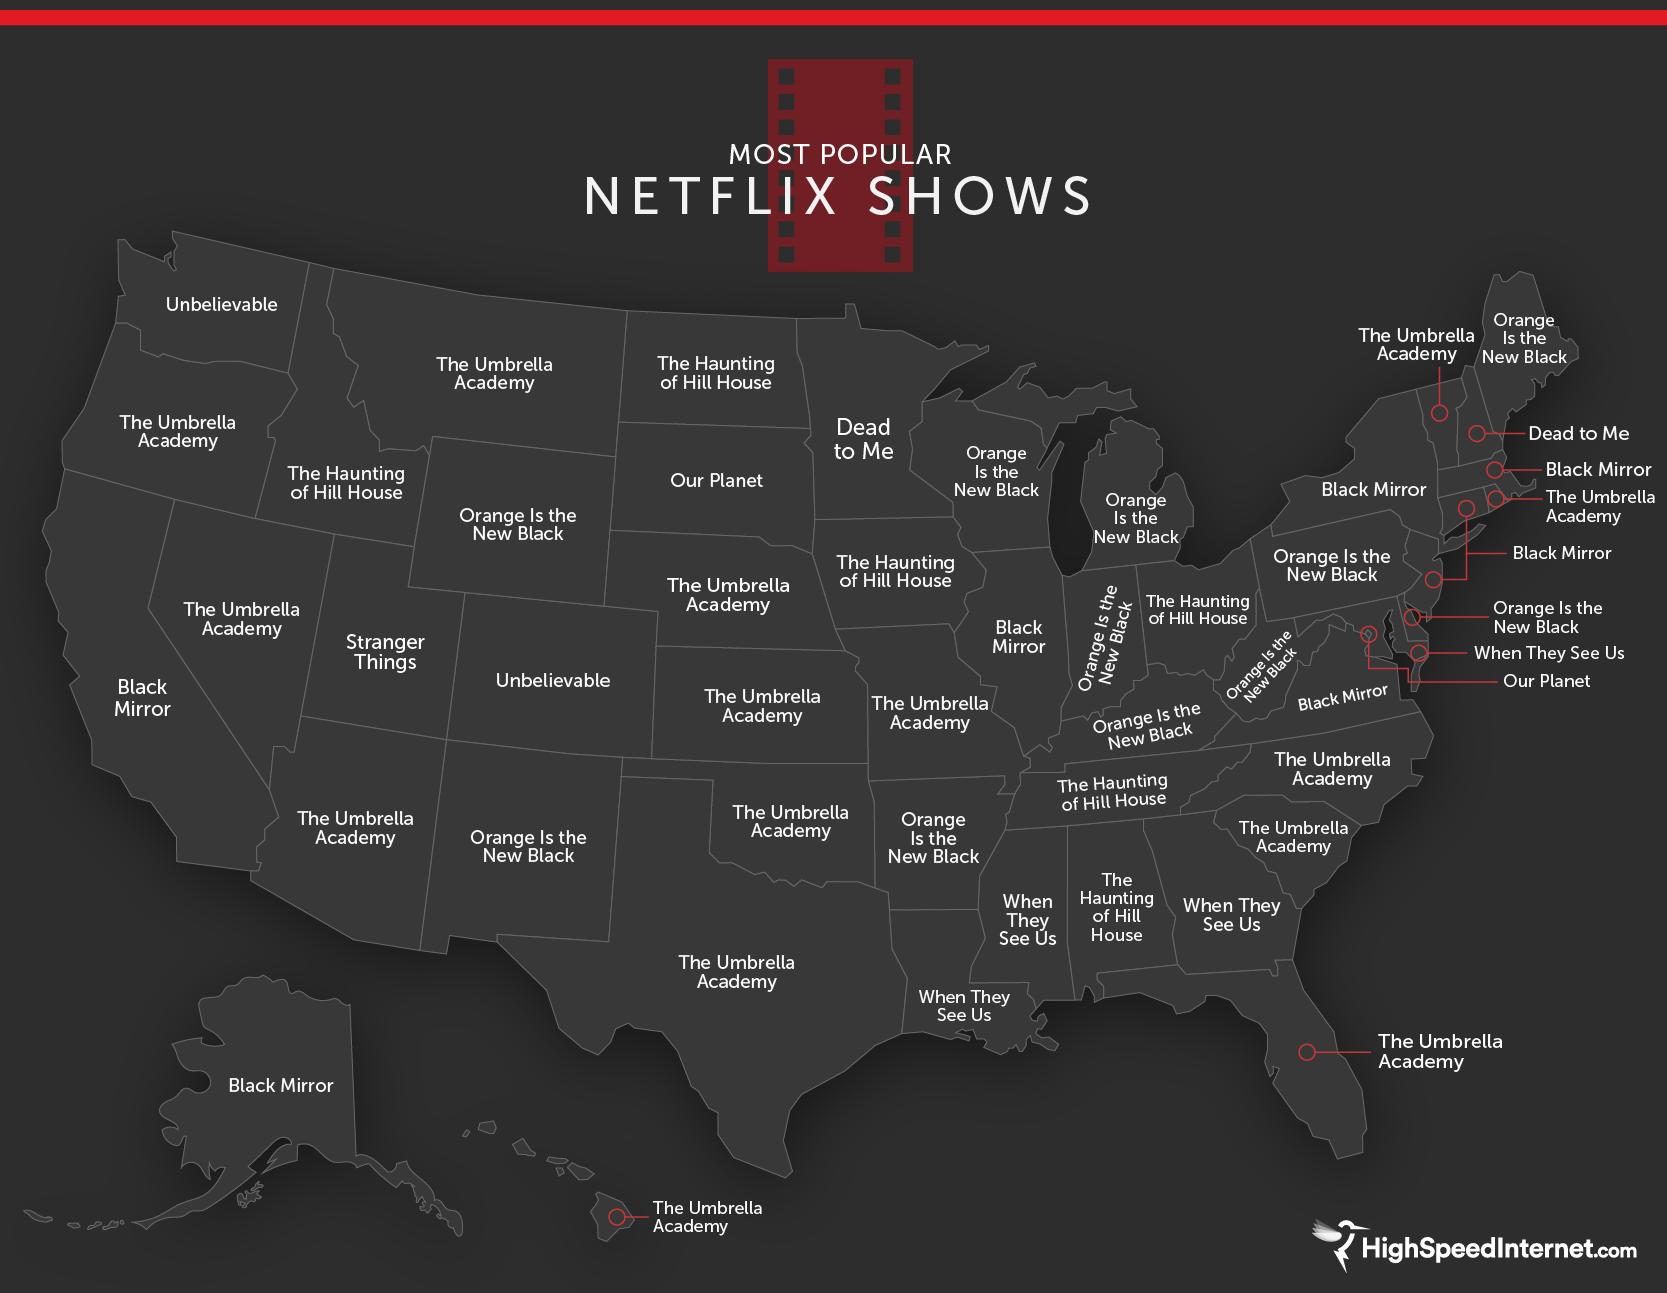 Netflix show popularity map.